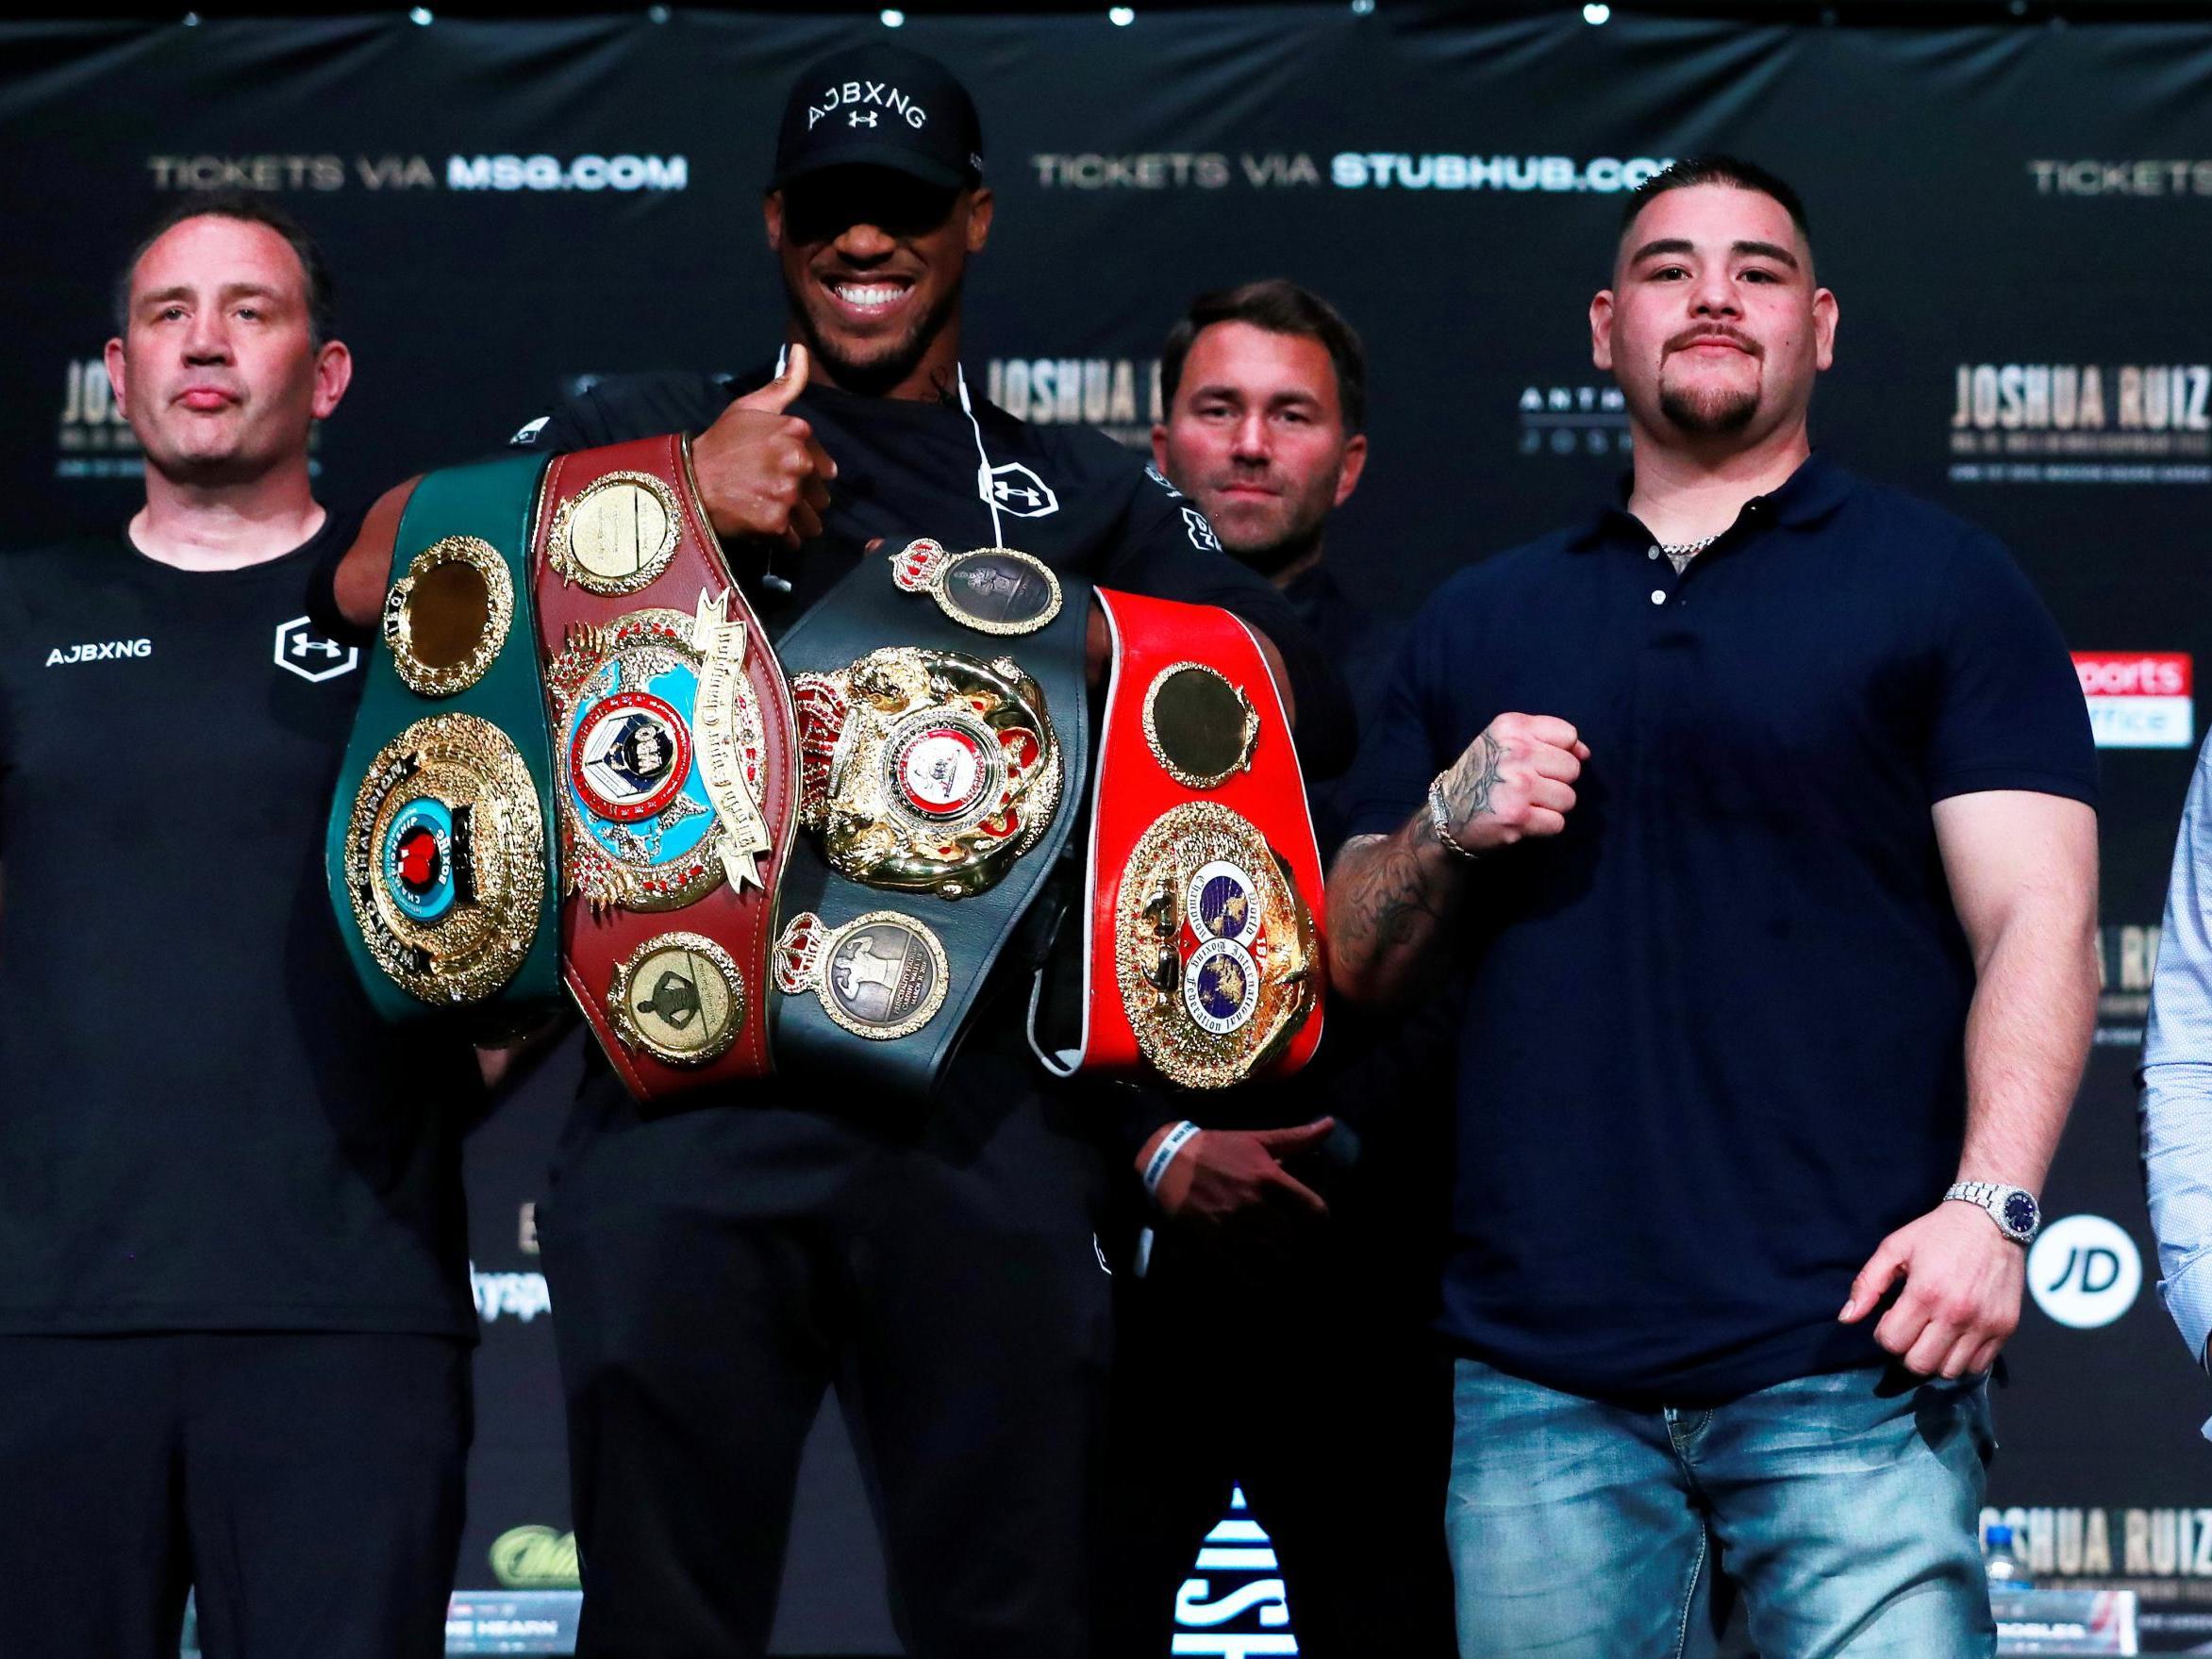 Joshua vs Ruiz: TV channel information, fight time tonight